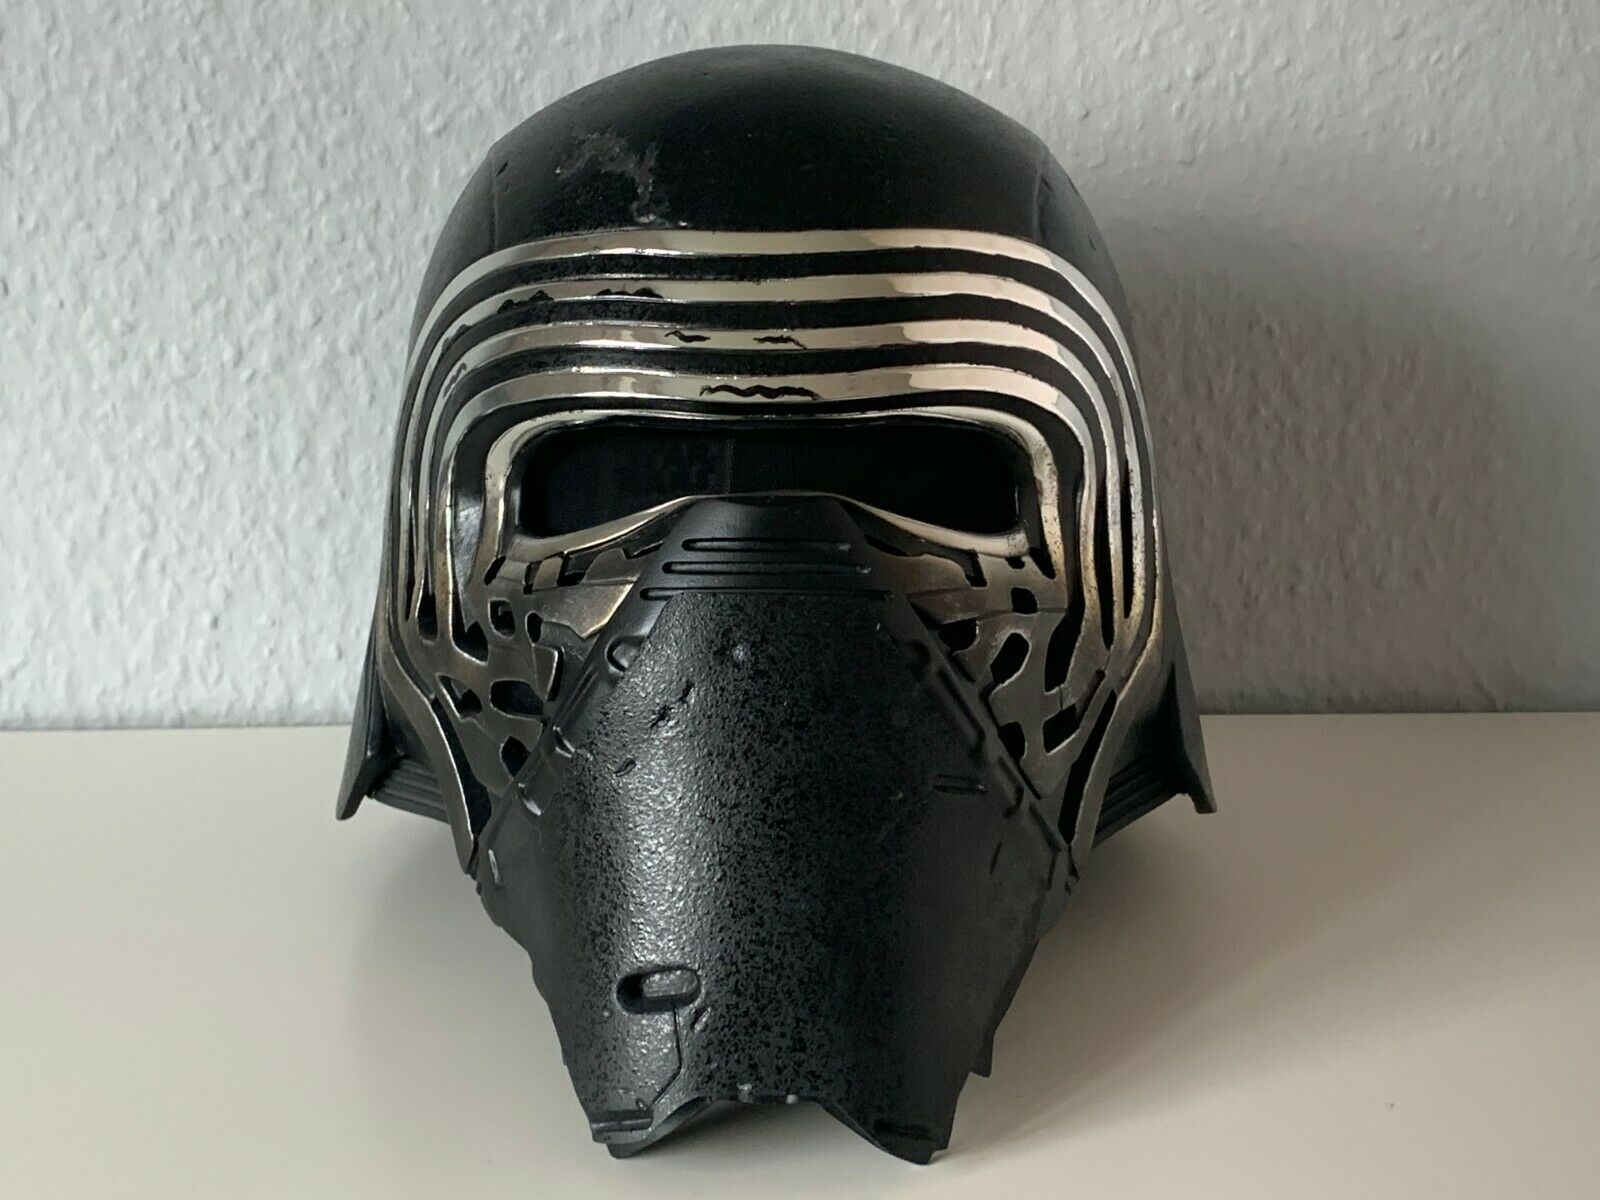 ANOVOS-Kylo-RenPremier-Line-Helmet-Star-Wars.jpg